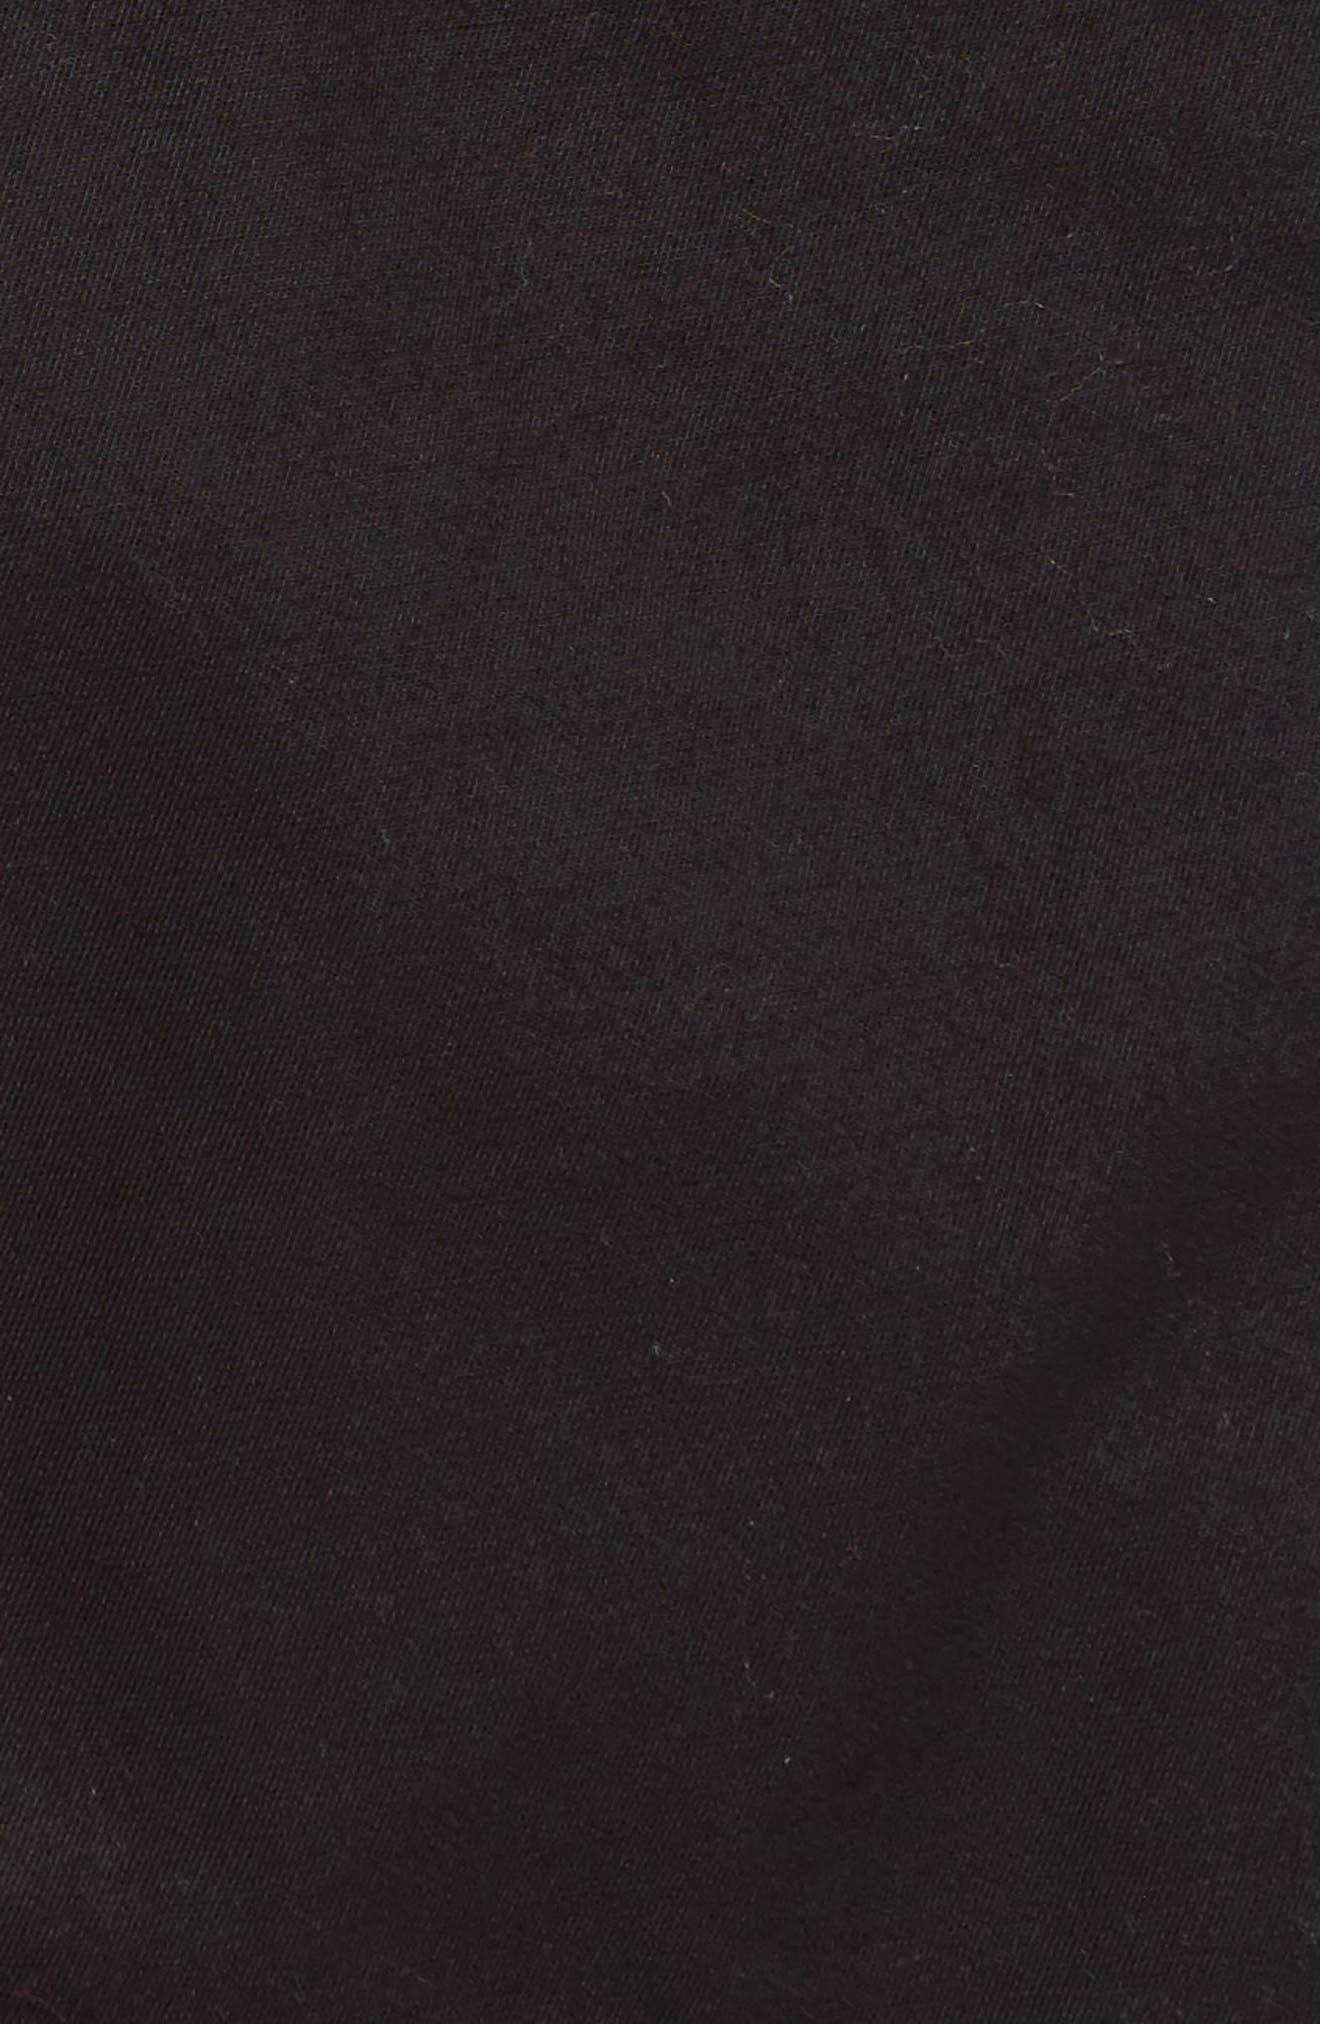 VSM Gritter Chino Shorts,                             Alternate thumbnail 5, color,